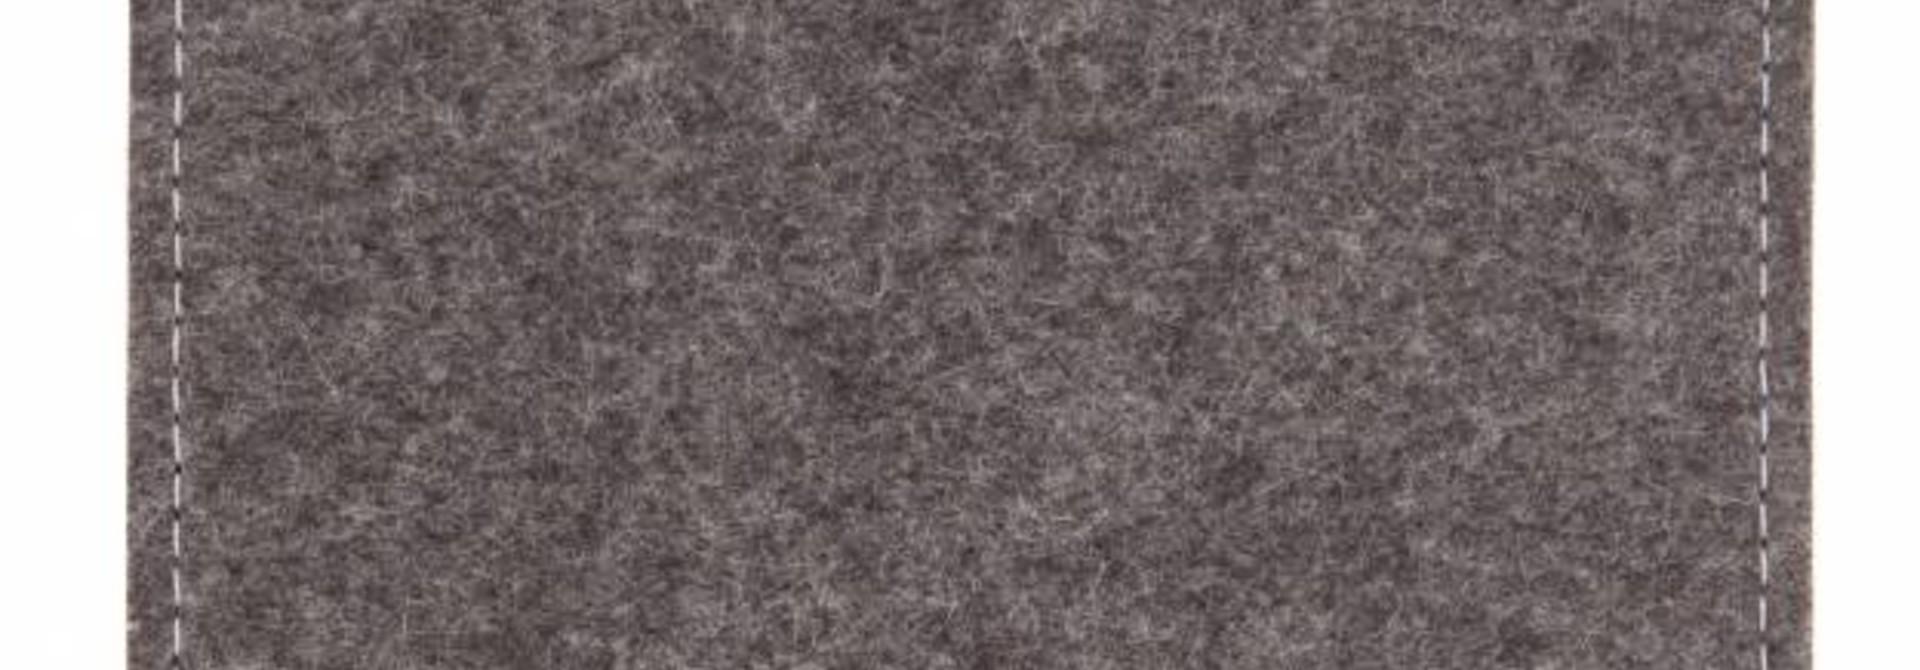 Xperia Tablet Sleeve Grey